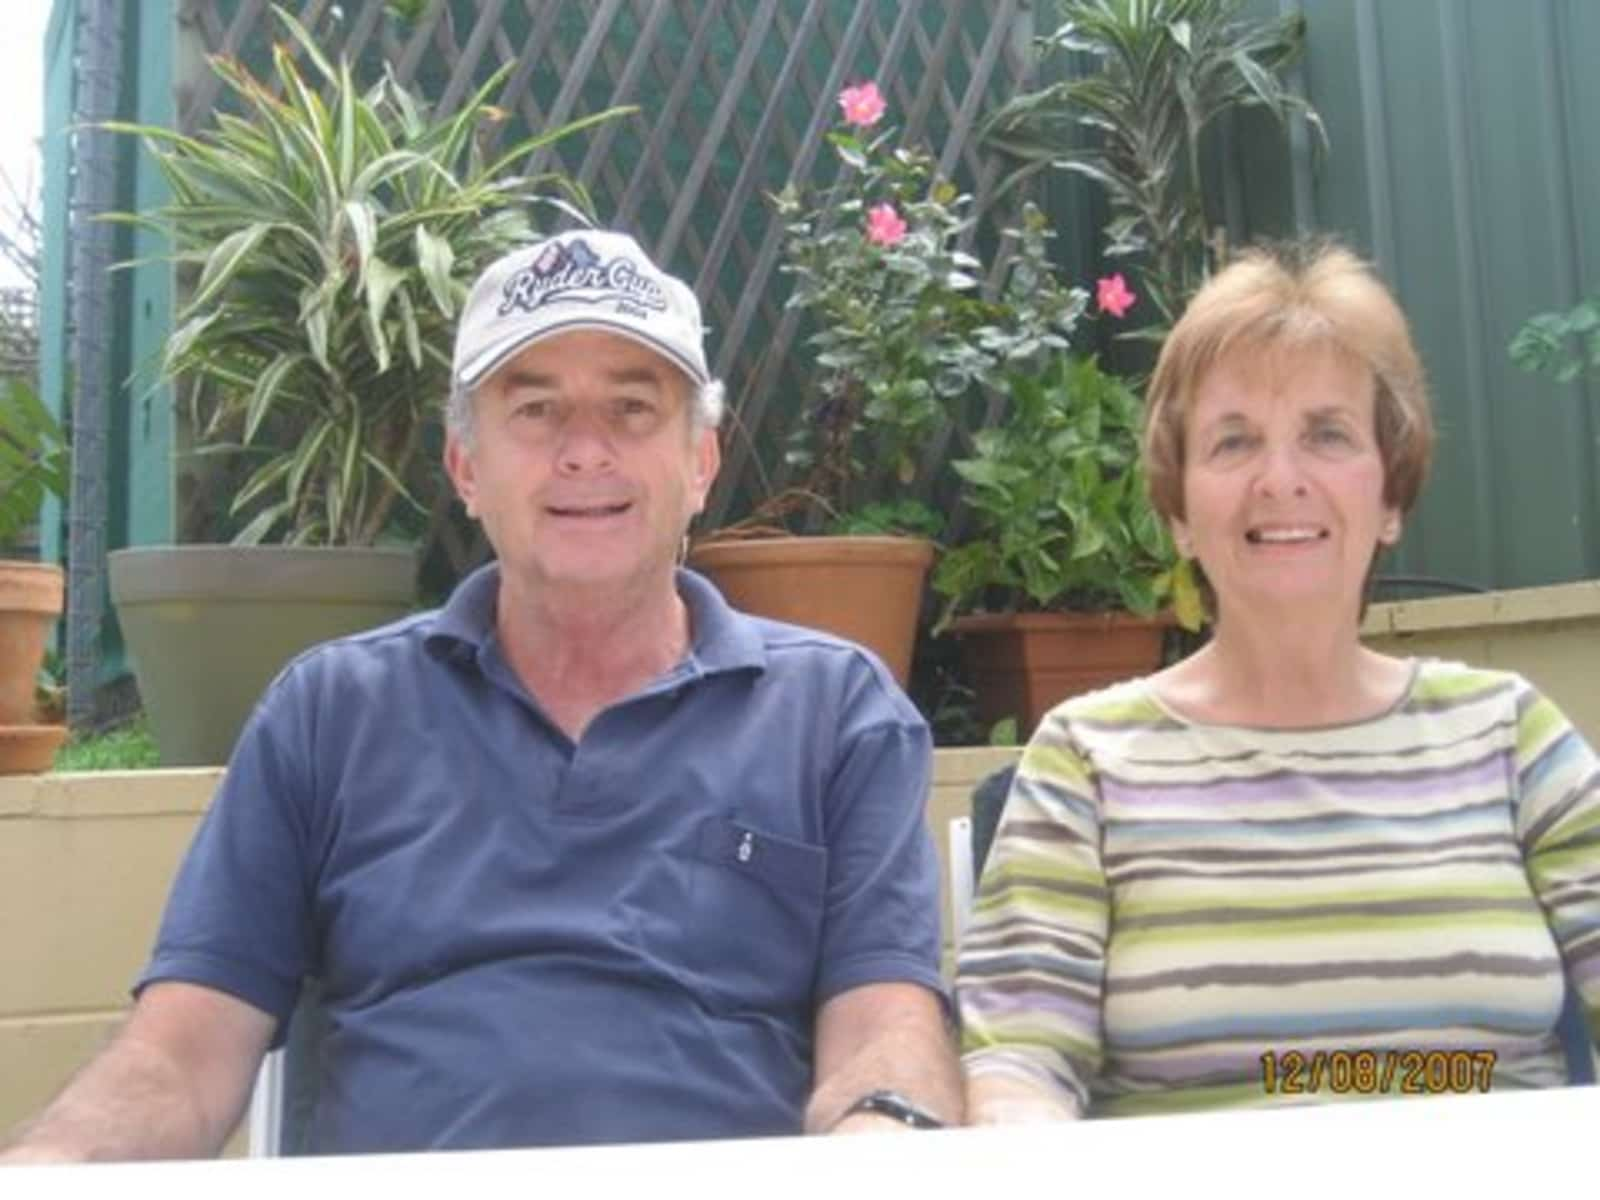 Peter & Beverley from South Brisbane, Queensland, Australia